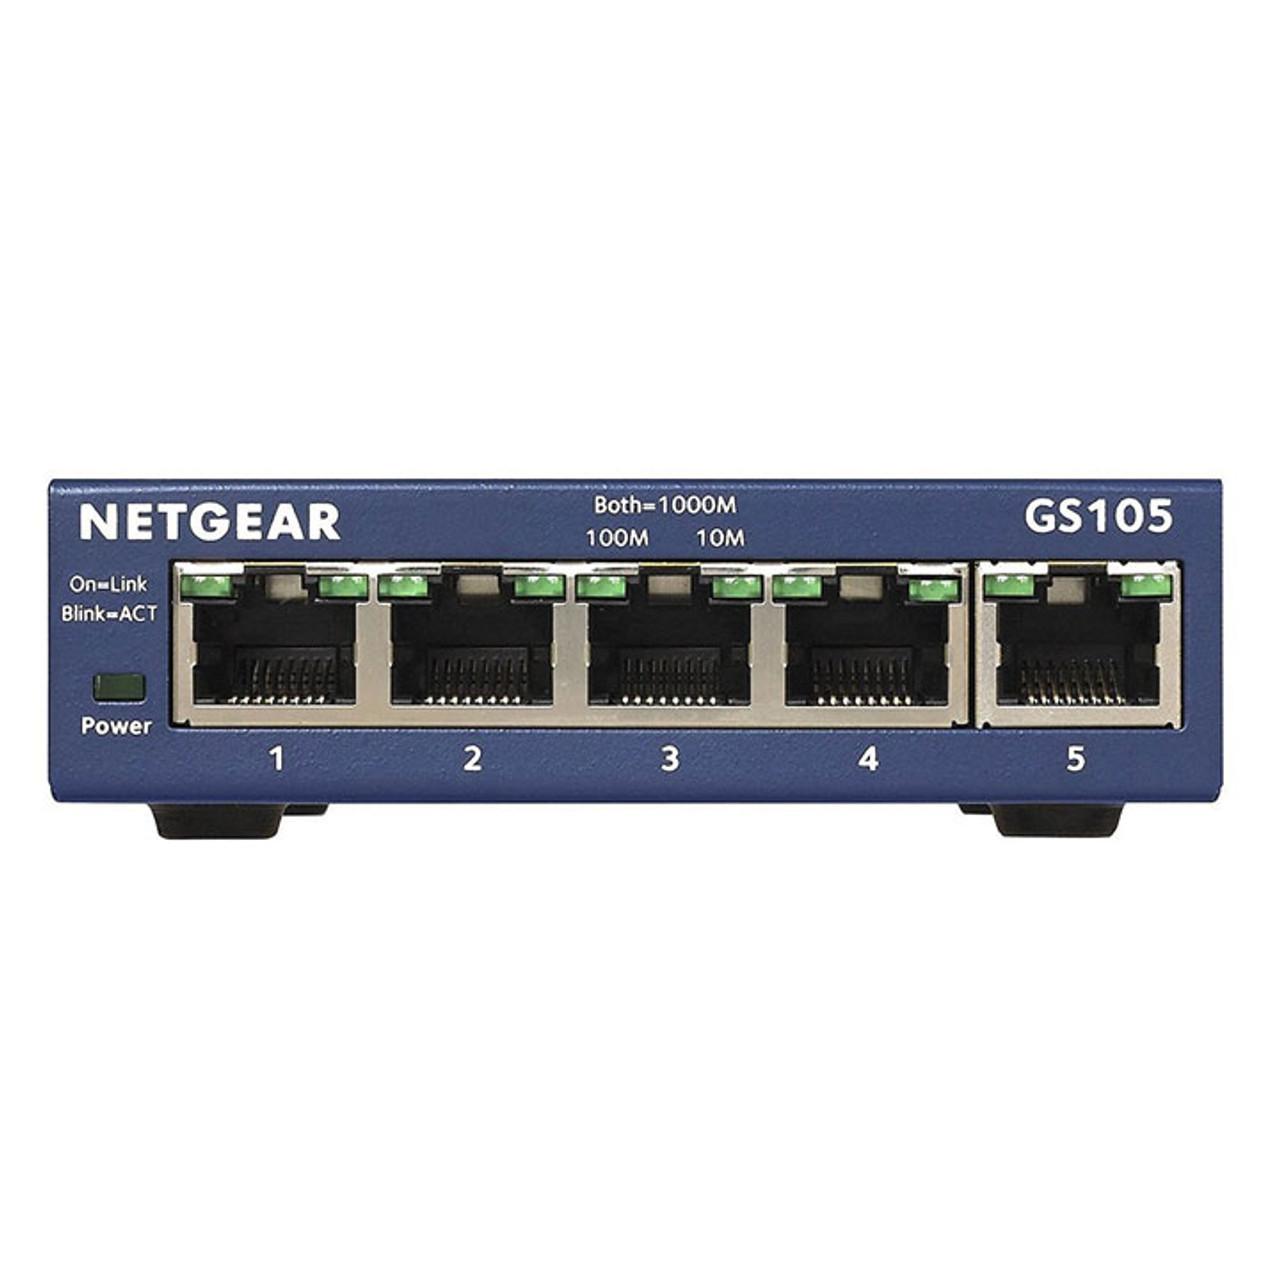 Netgear ProSAFE 5-Port Gigabit Ethernet Switch (GS105)